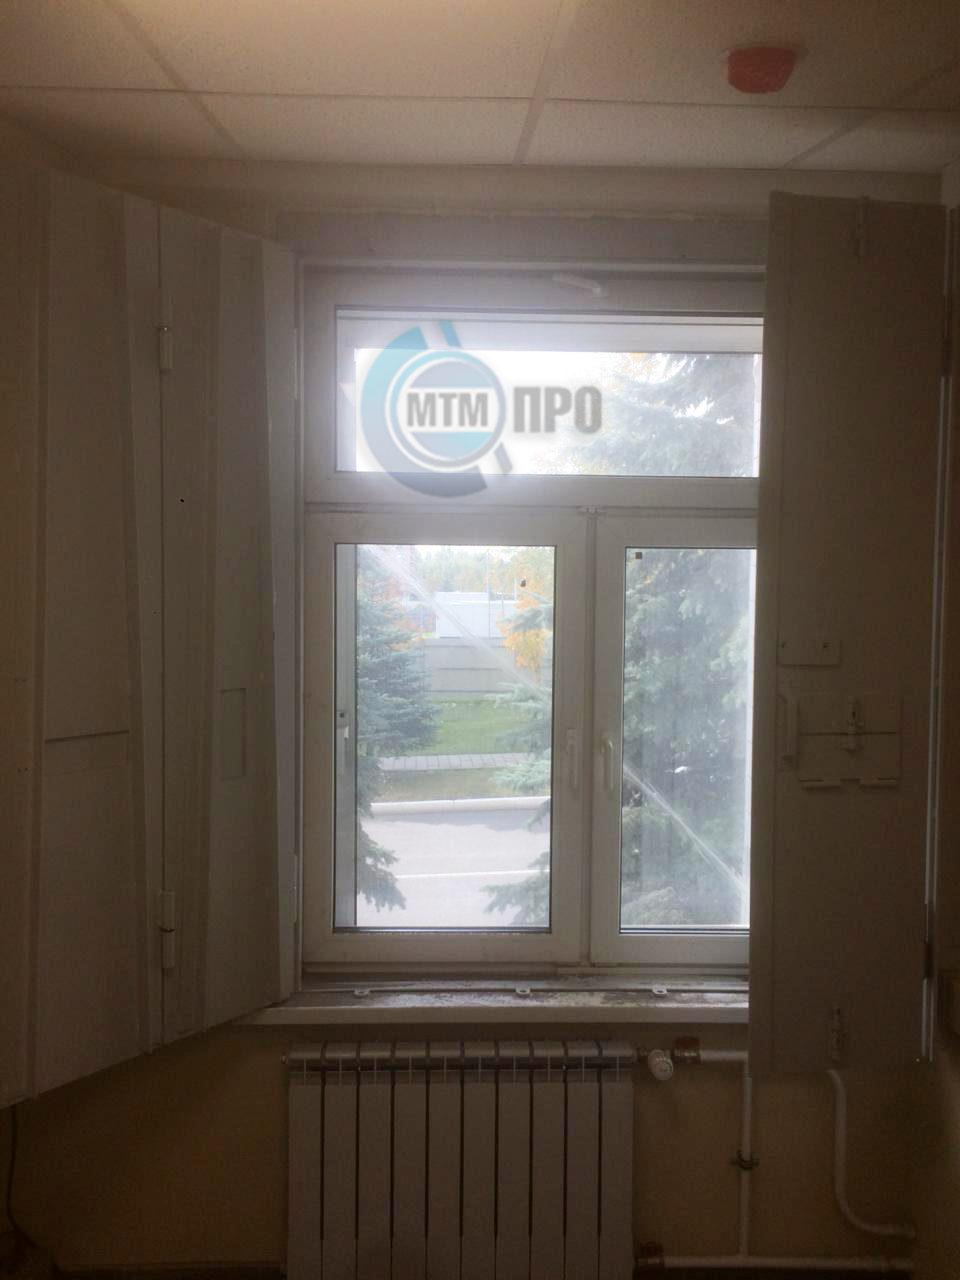 http://mtm-pro.ru/wp-content/uploads/2018/12/stavni-gorm-6-960x1280.jpg